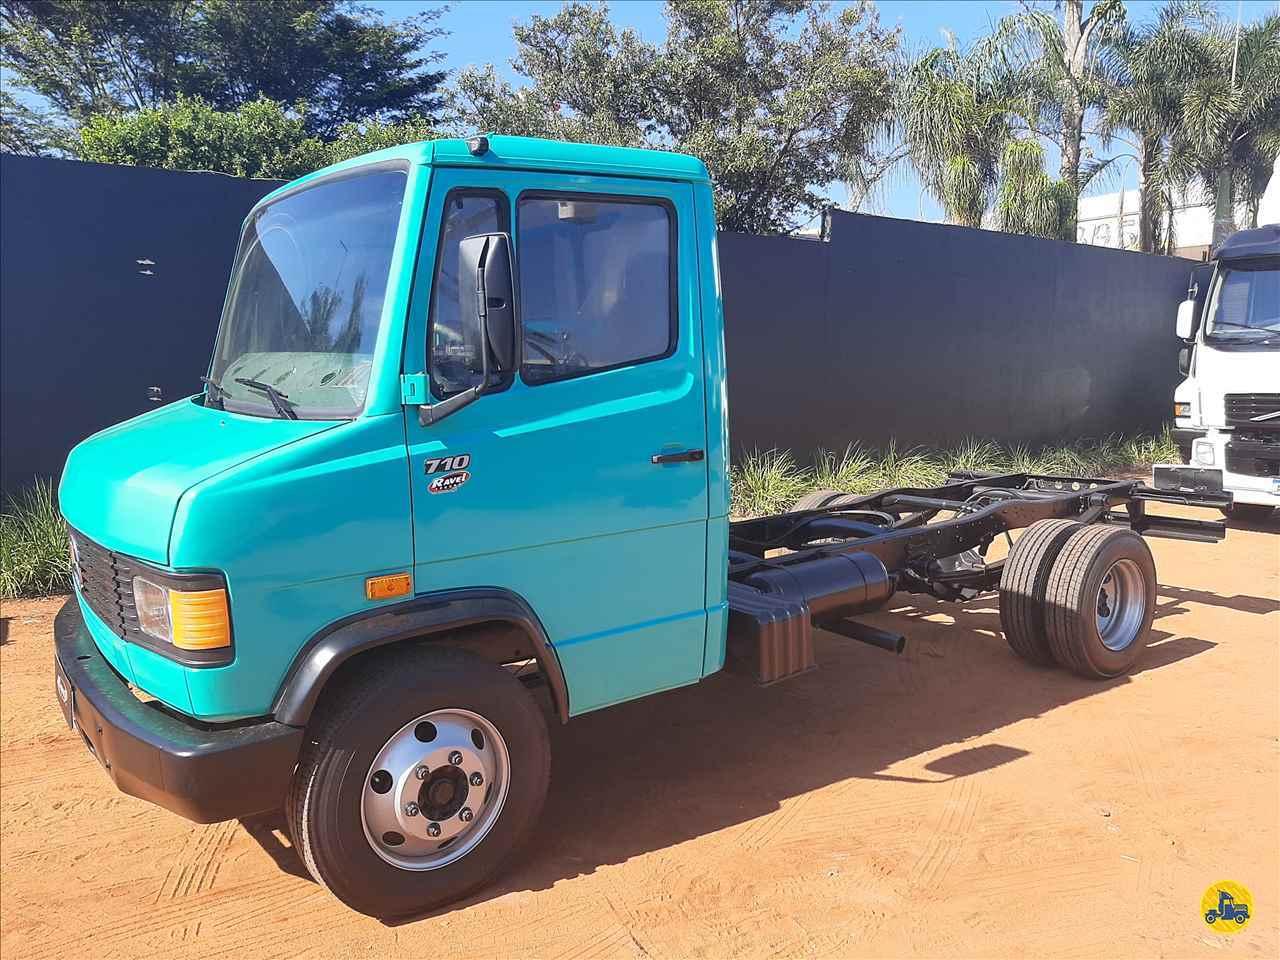 MERCEDES-BENZ MB 710 300000km 2000/2000 Ravel Trucks